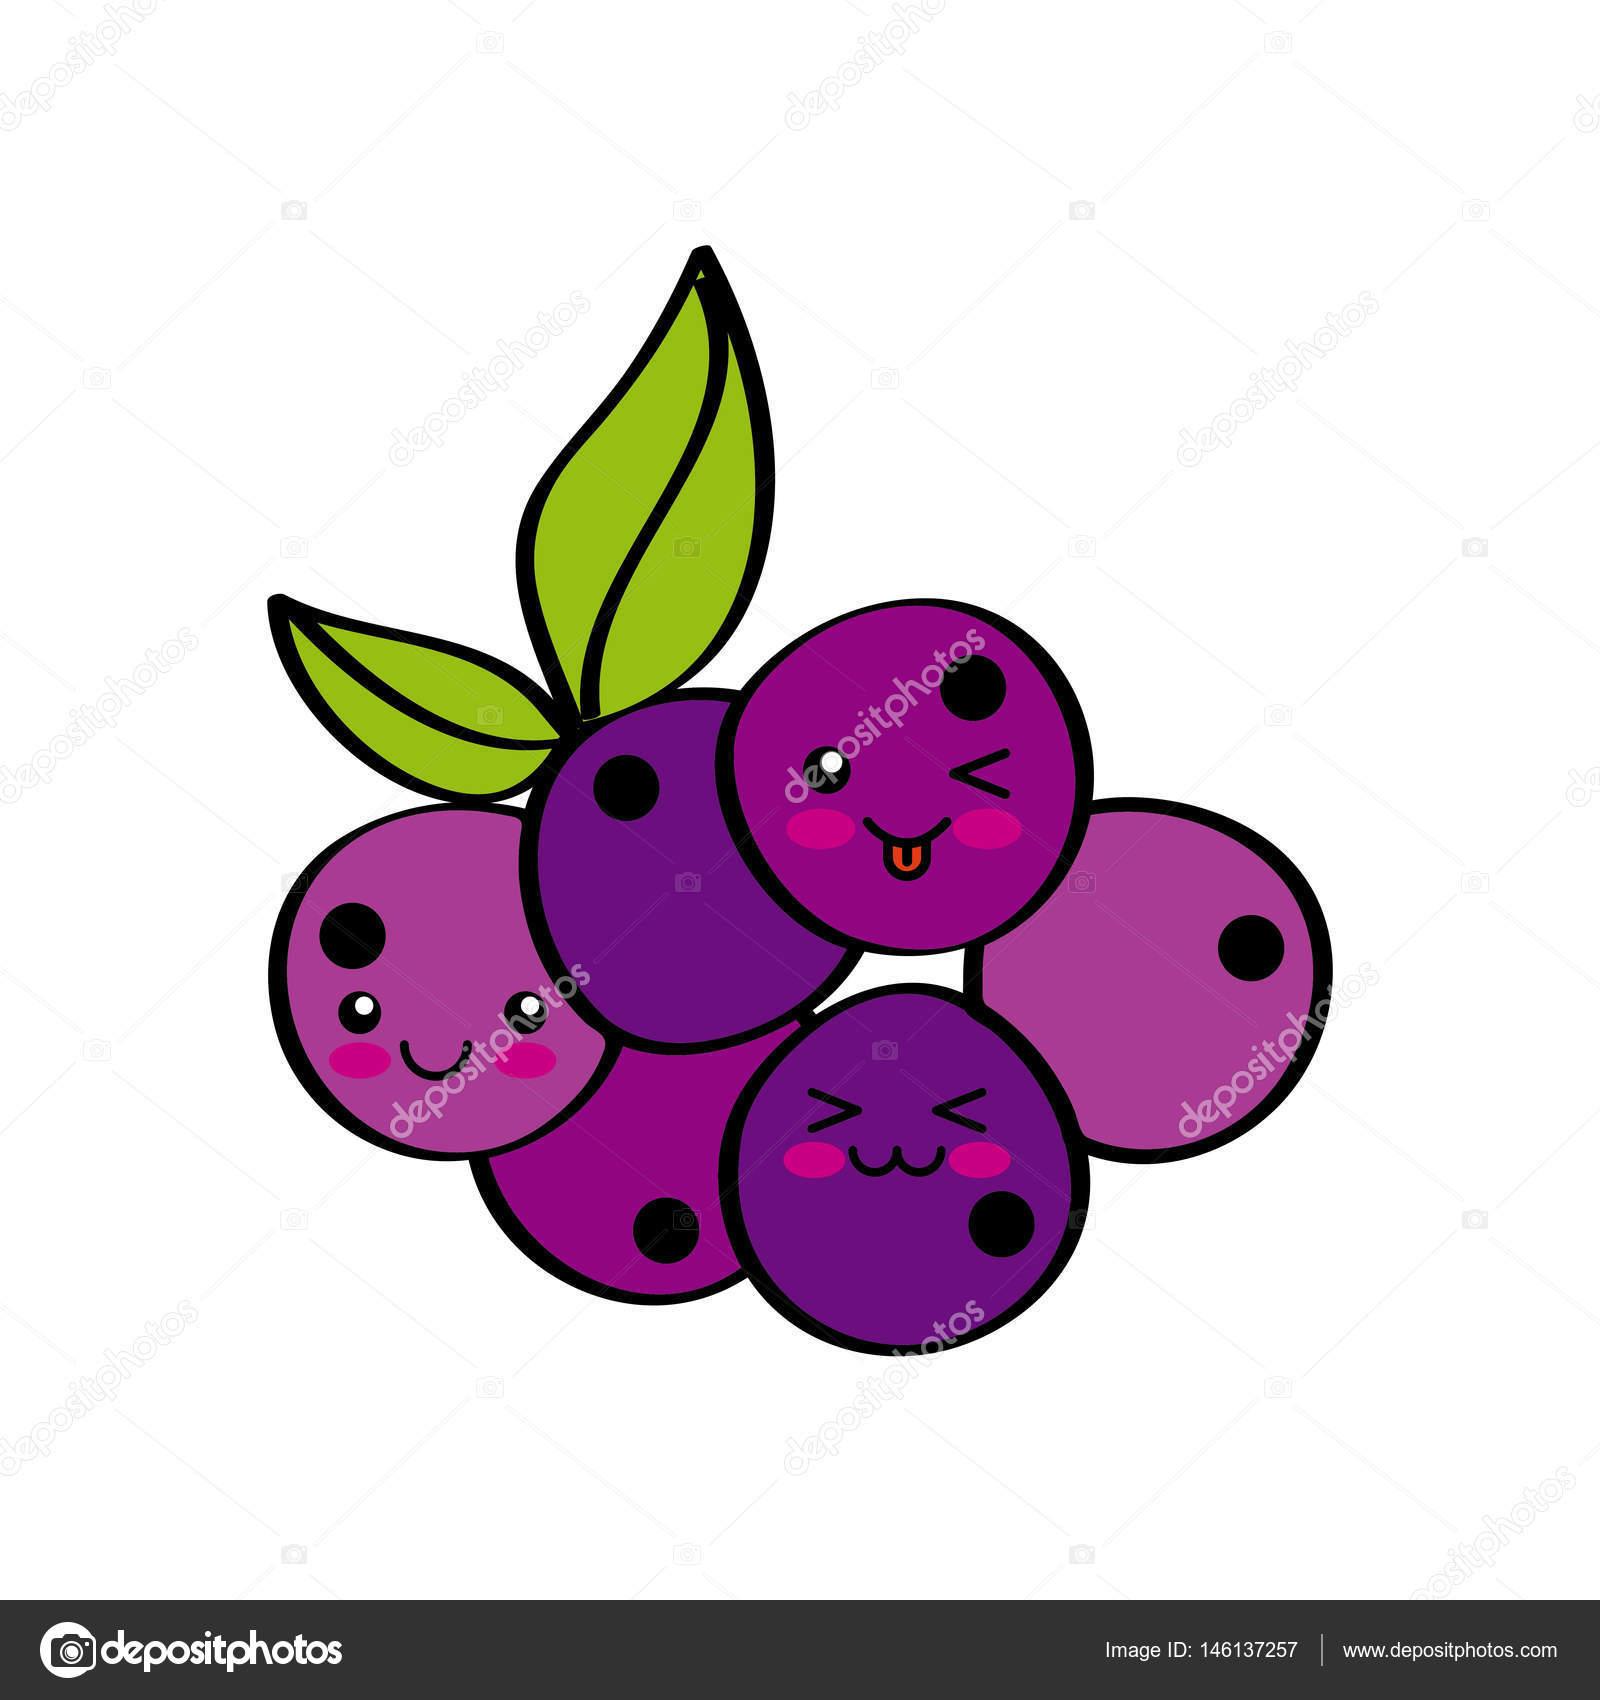 Kawaii Früchte Design Stockvektor Yupiramos 146137257